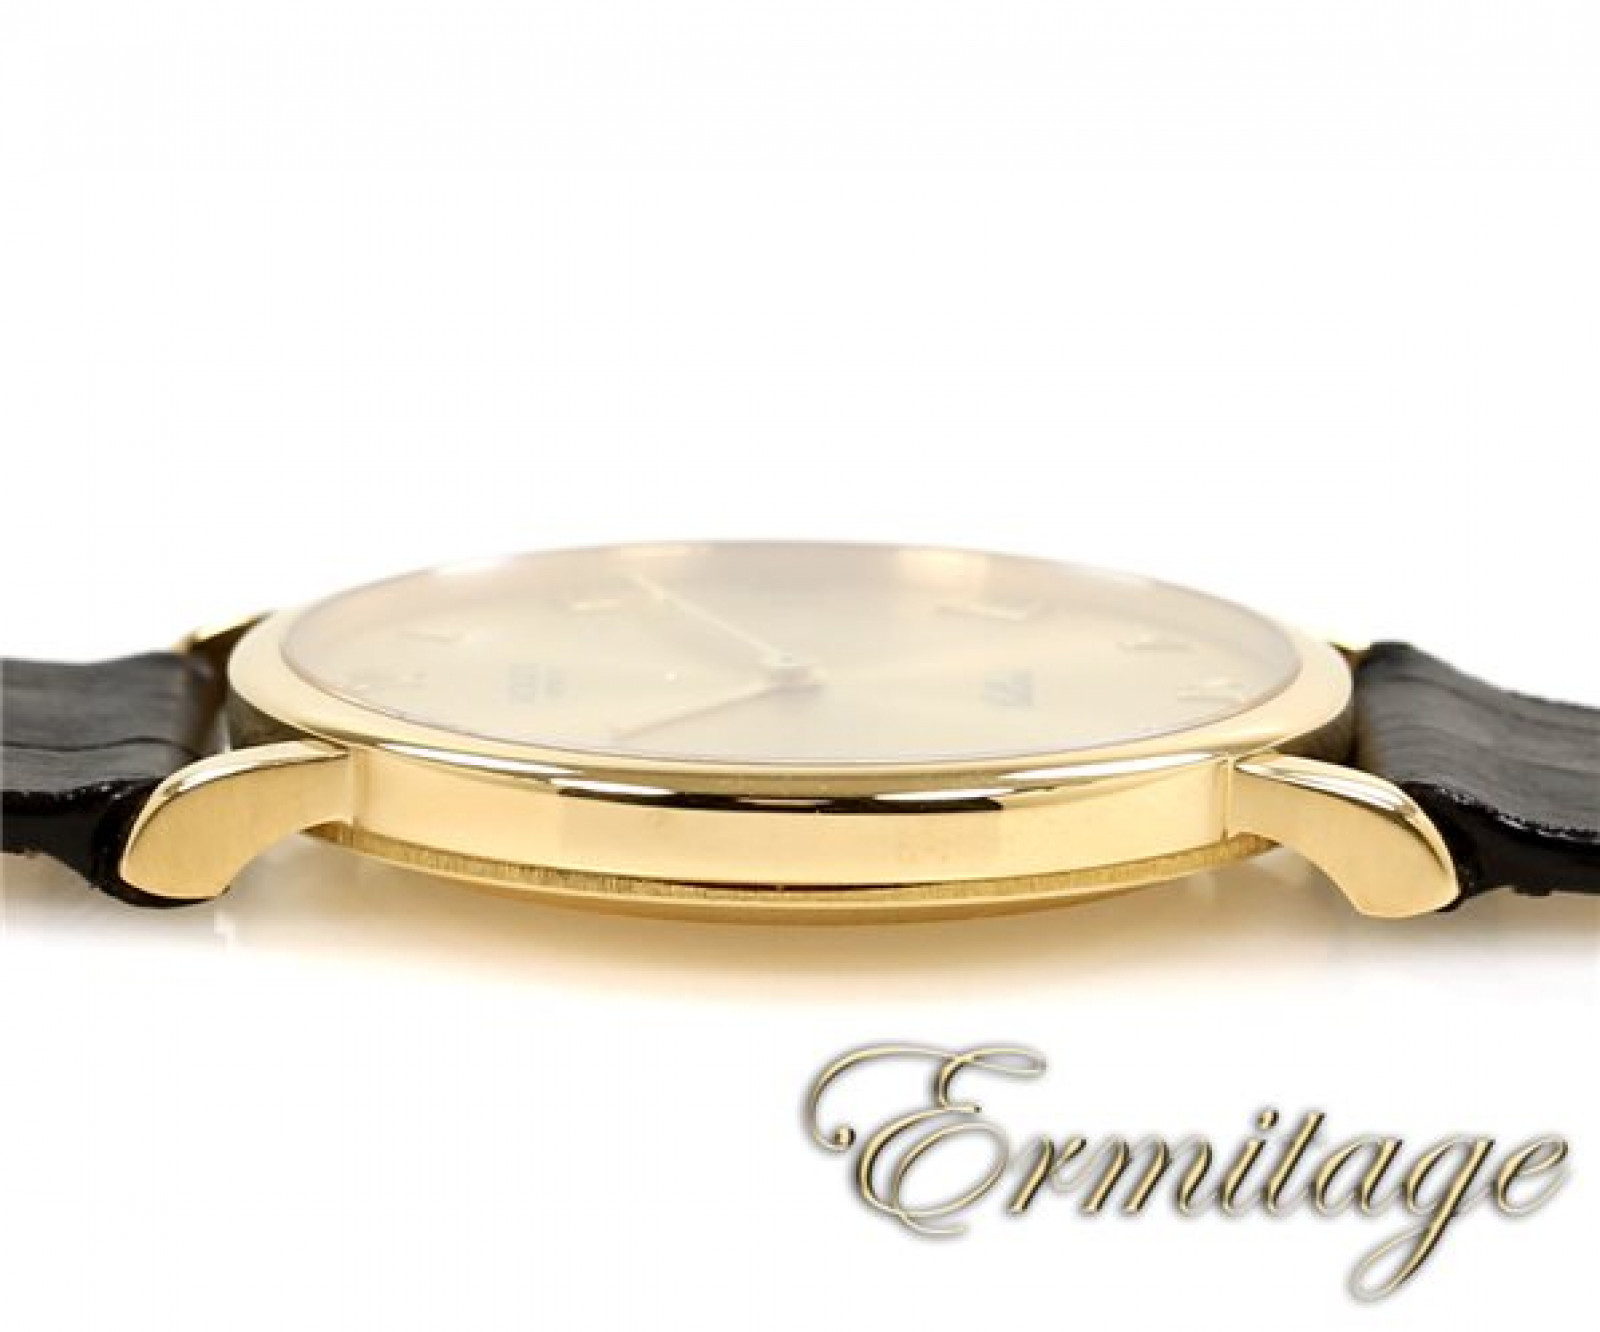 Rolex Cellini 5112 Gold 32 mm